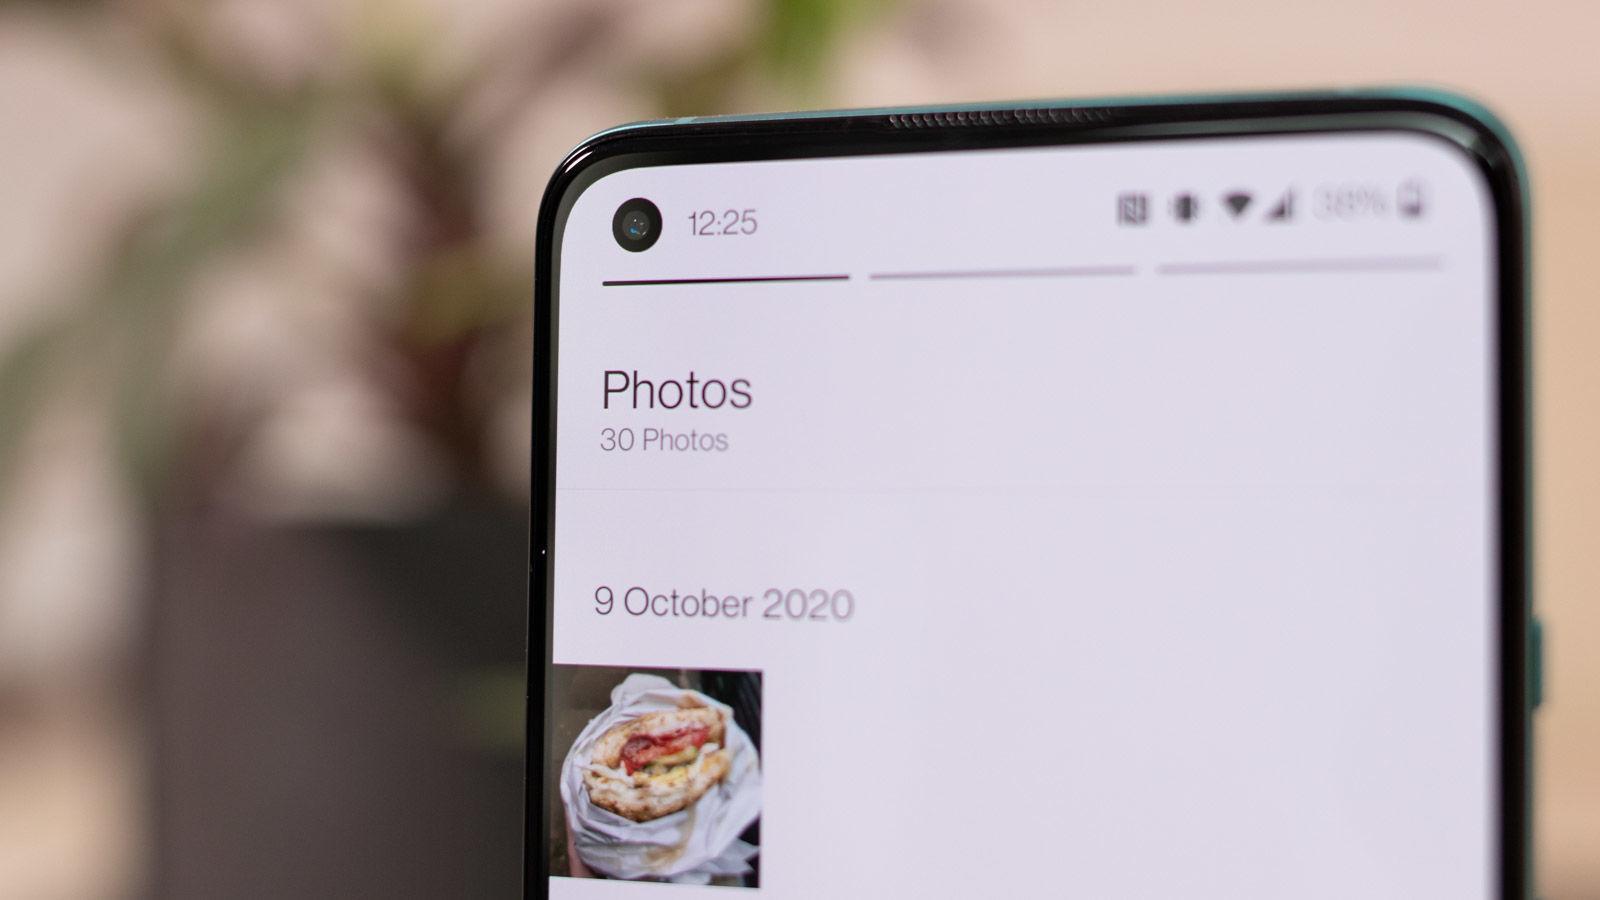 OnePlus 8T selfie camera